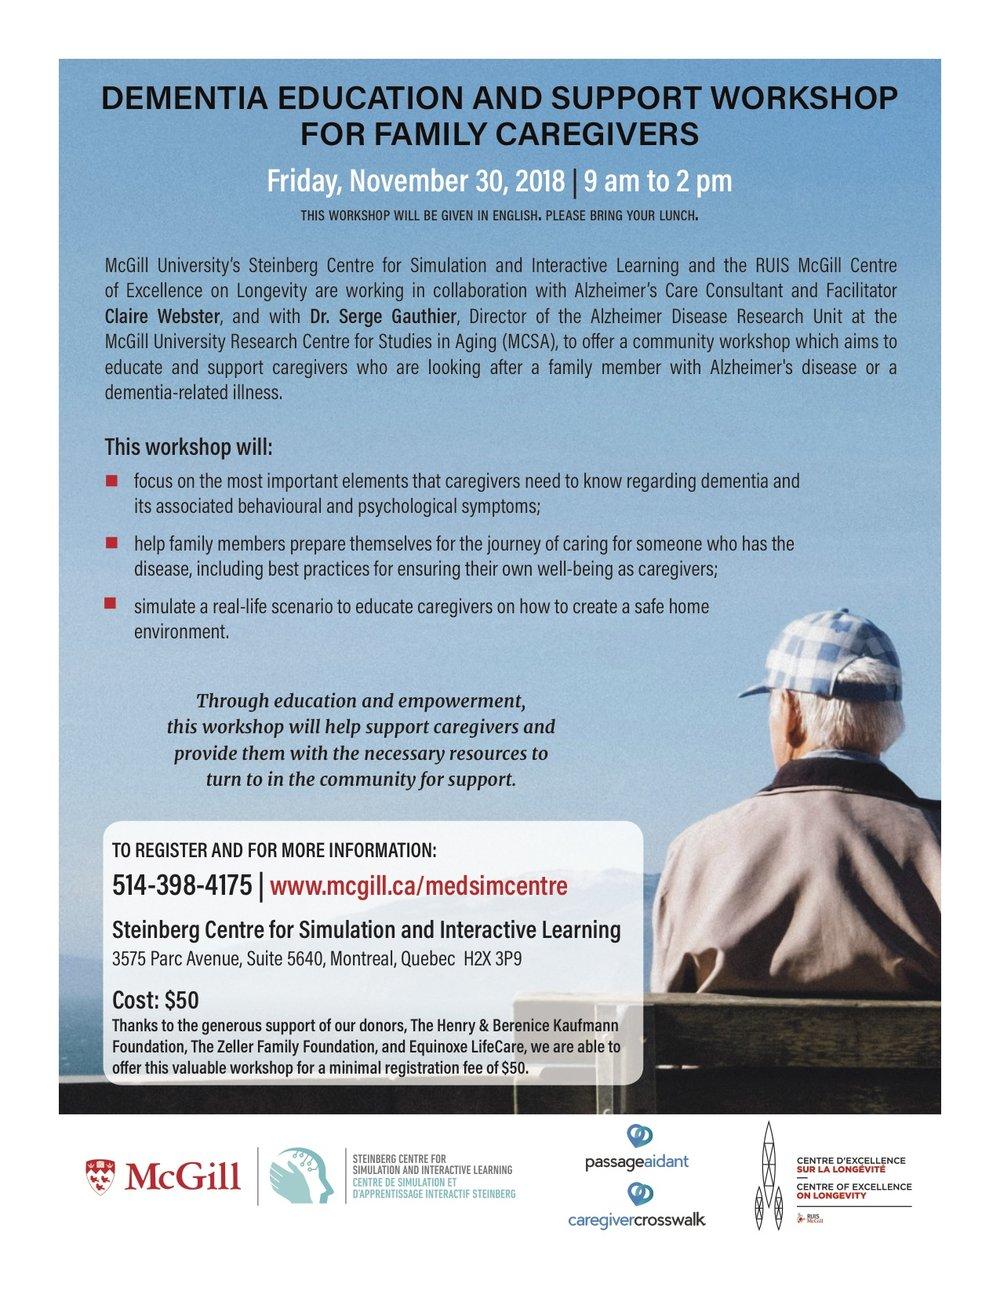 Dementia_Workshop_Flyer_30_Nov_2018_v4_EN copy.jpg